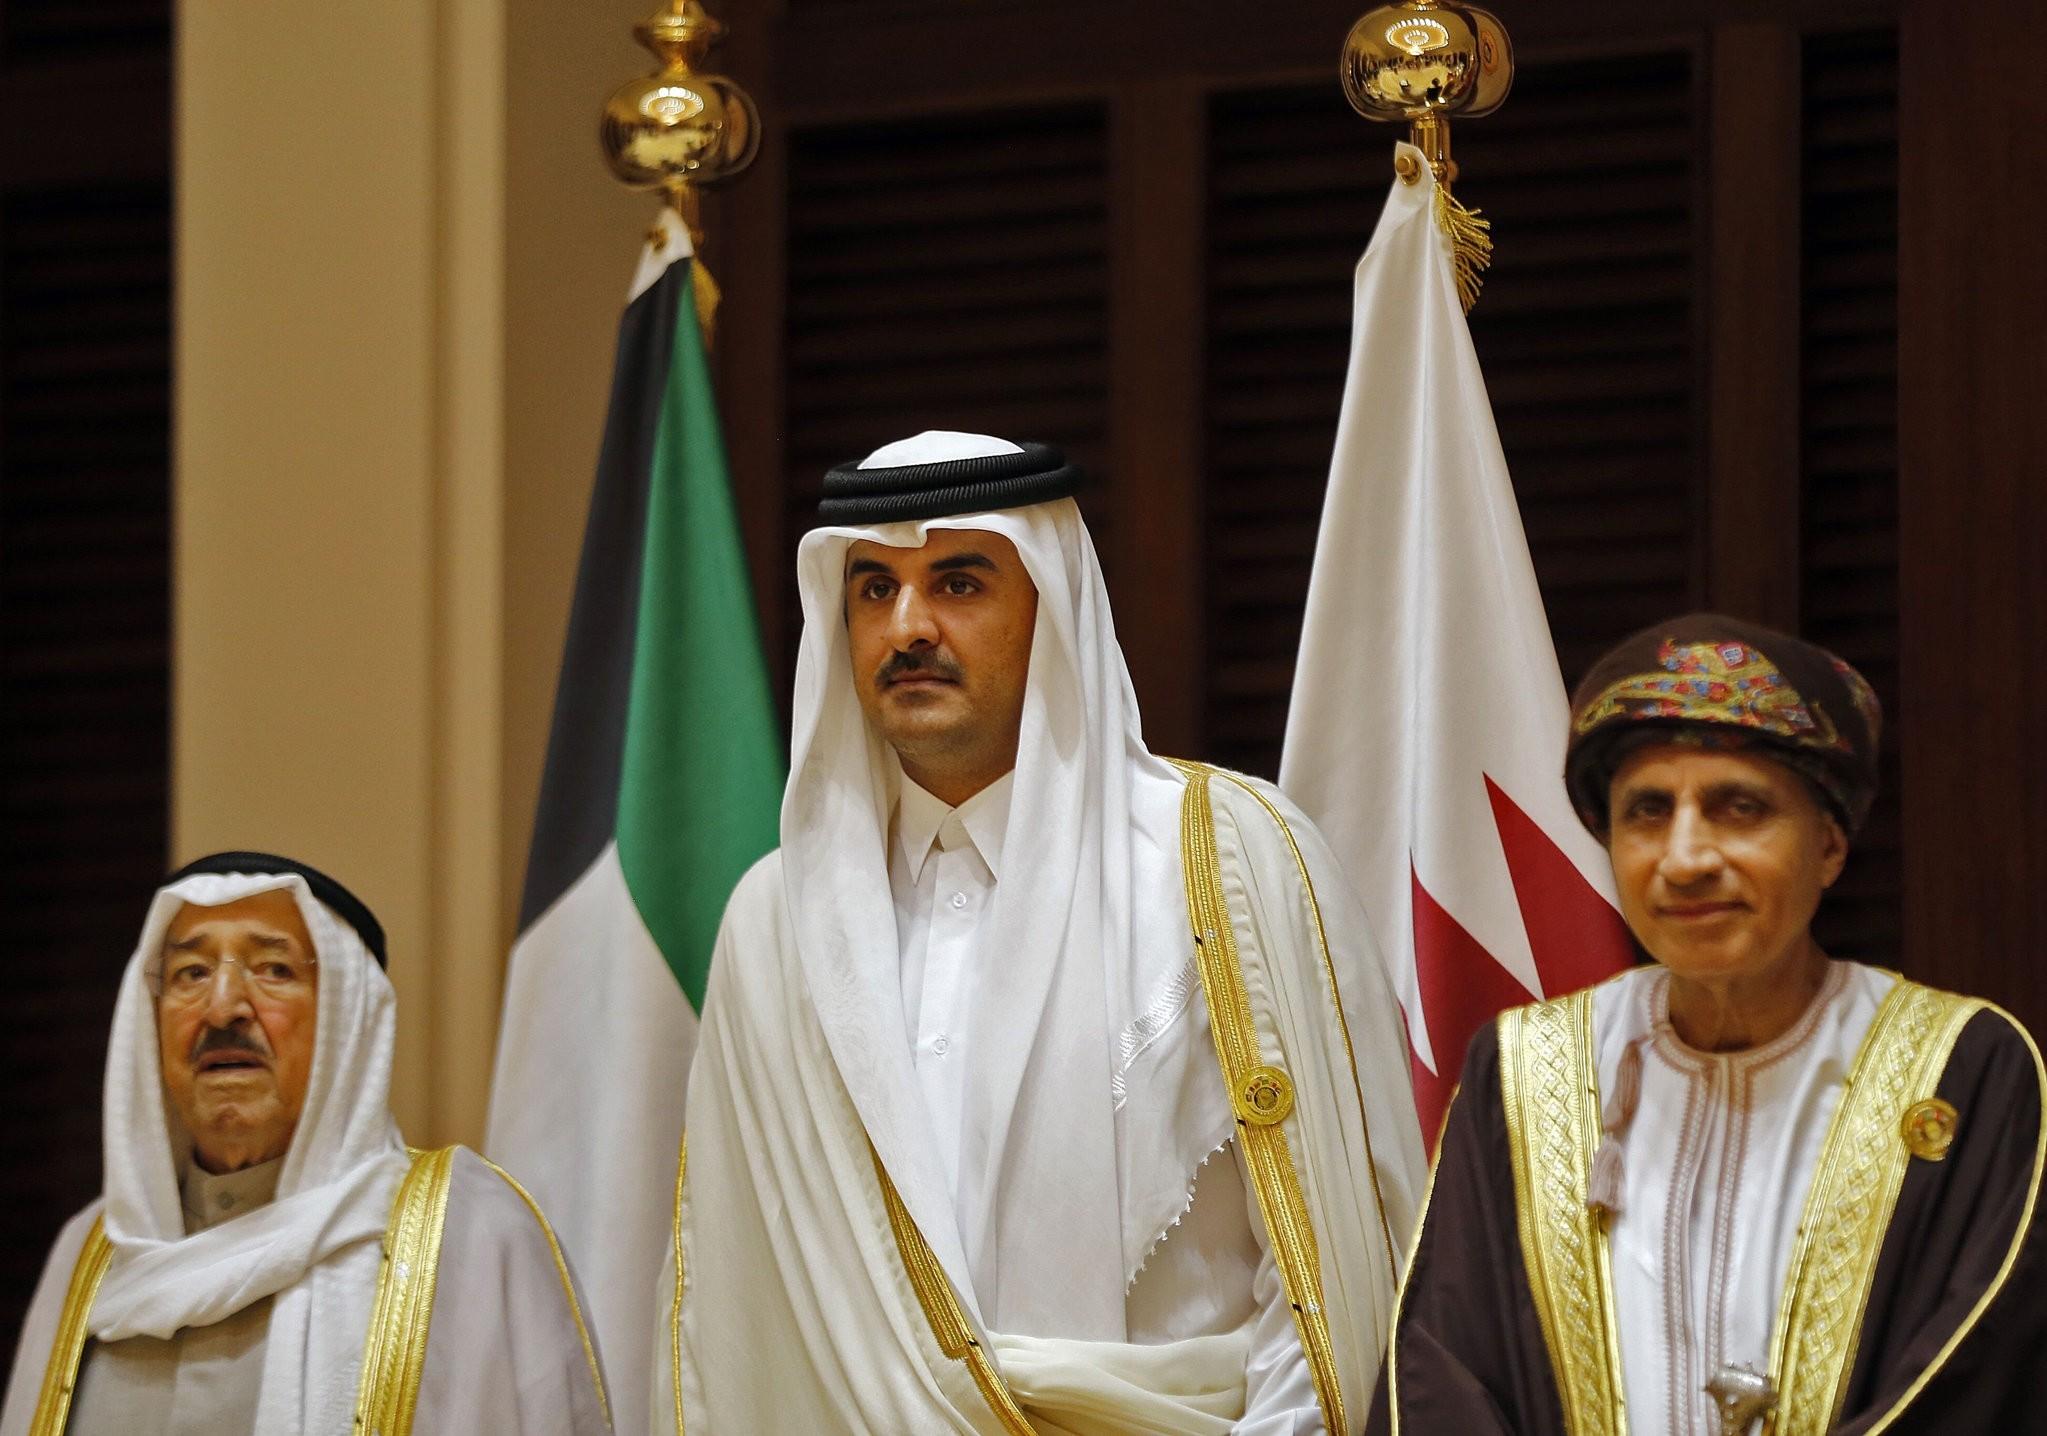 Emir of Kuwait Sabah al-Ahmad al-Jaber al-Sabah (L), Emir of Qatar Sheikh Tamim bin Hamad al-Thani (C). (AFP Photo)